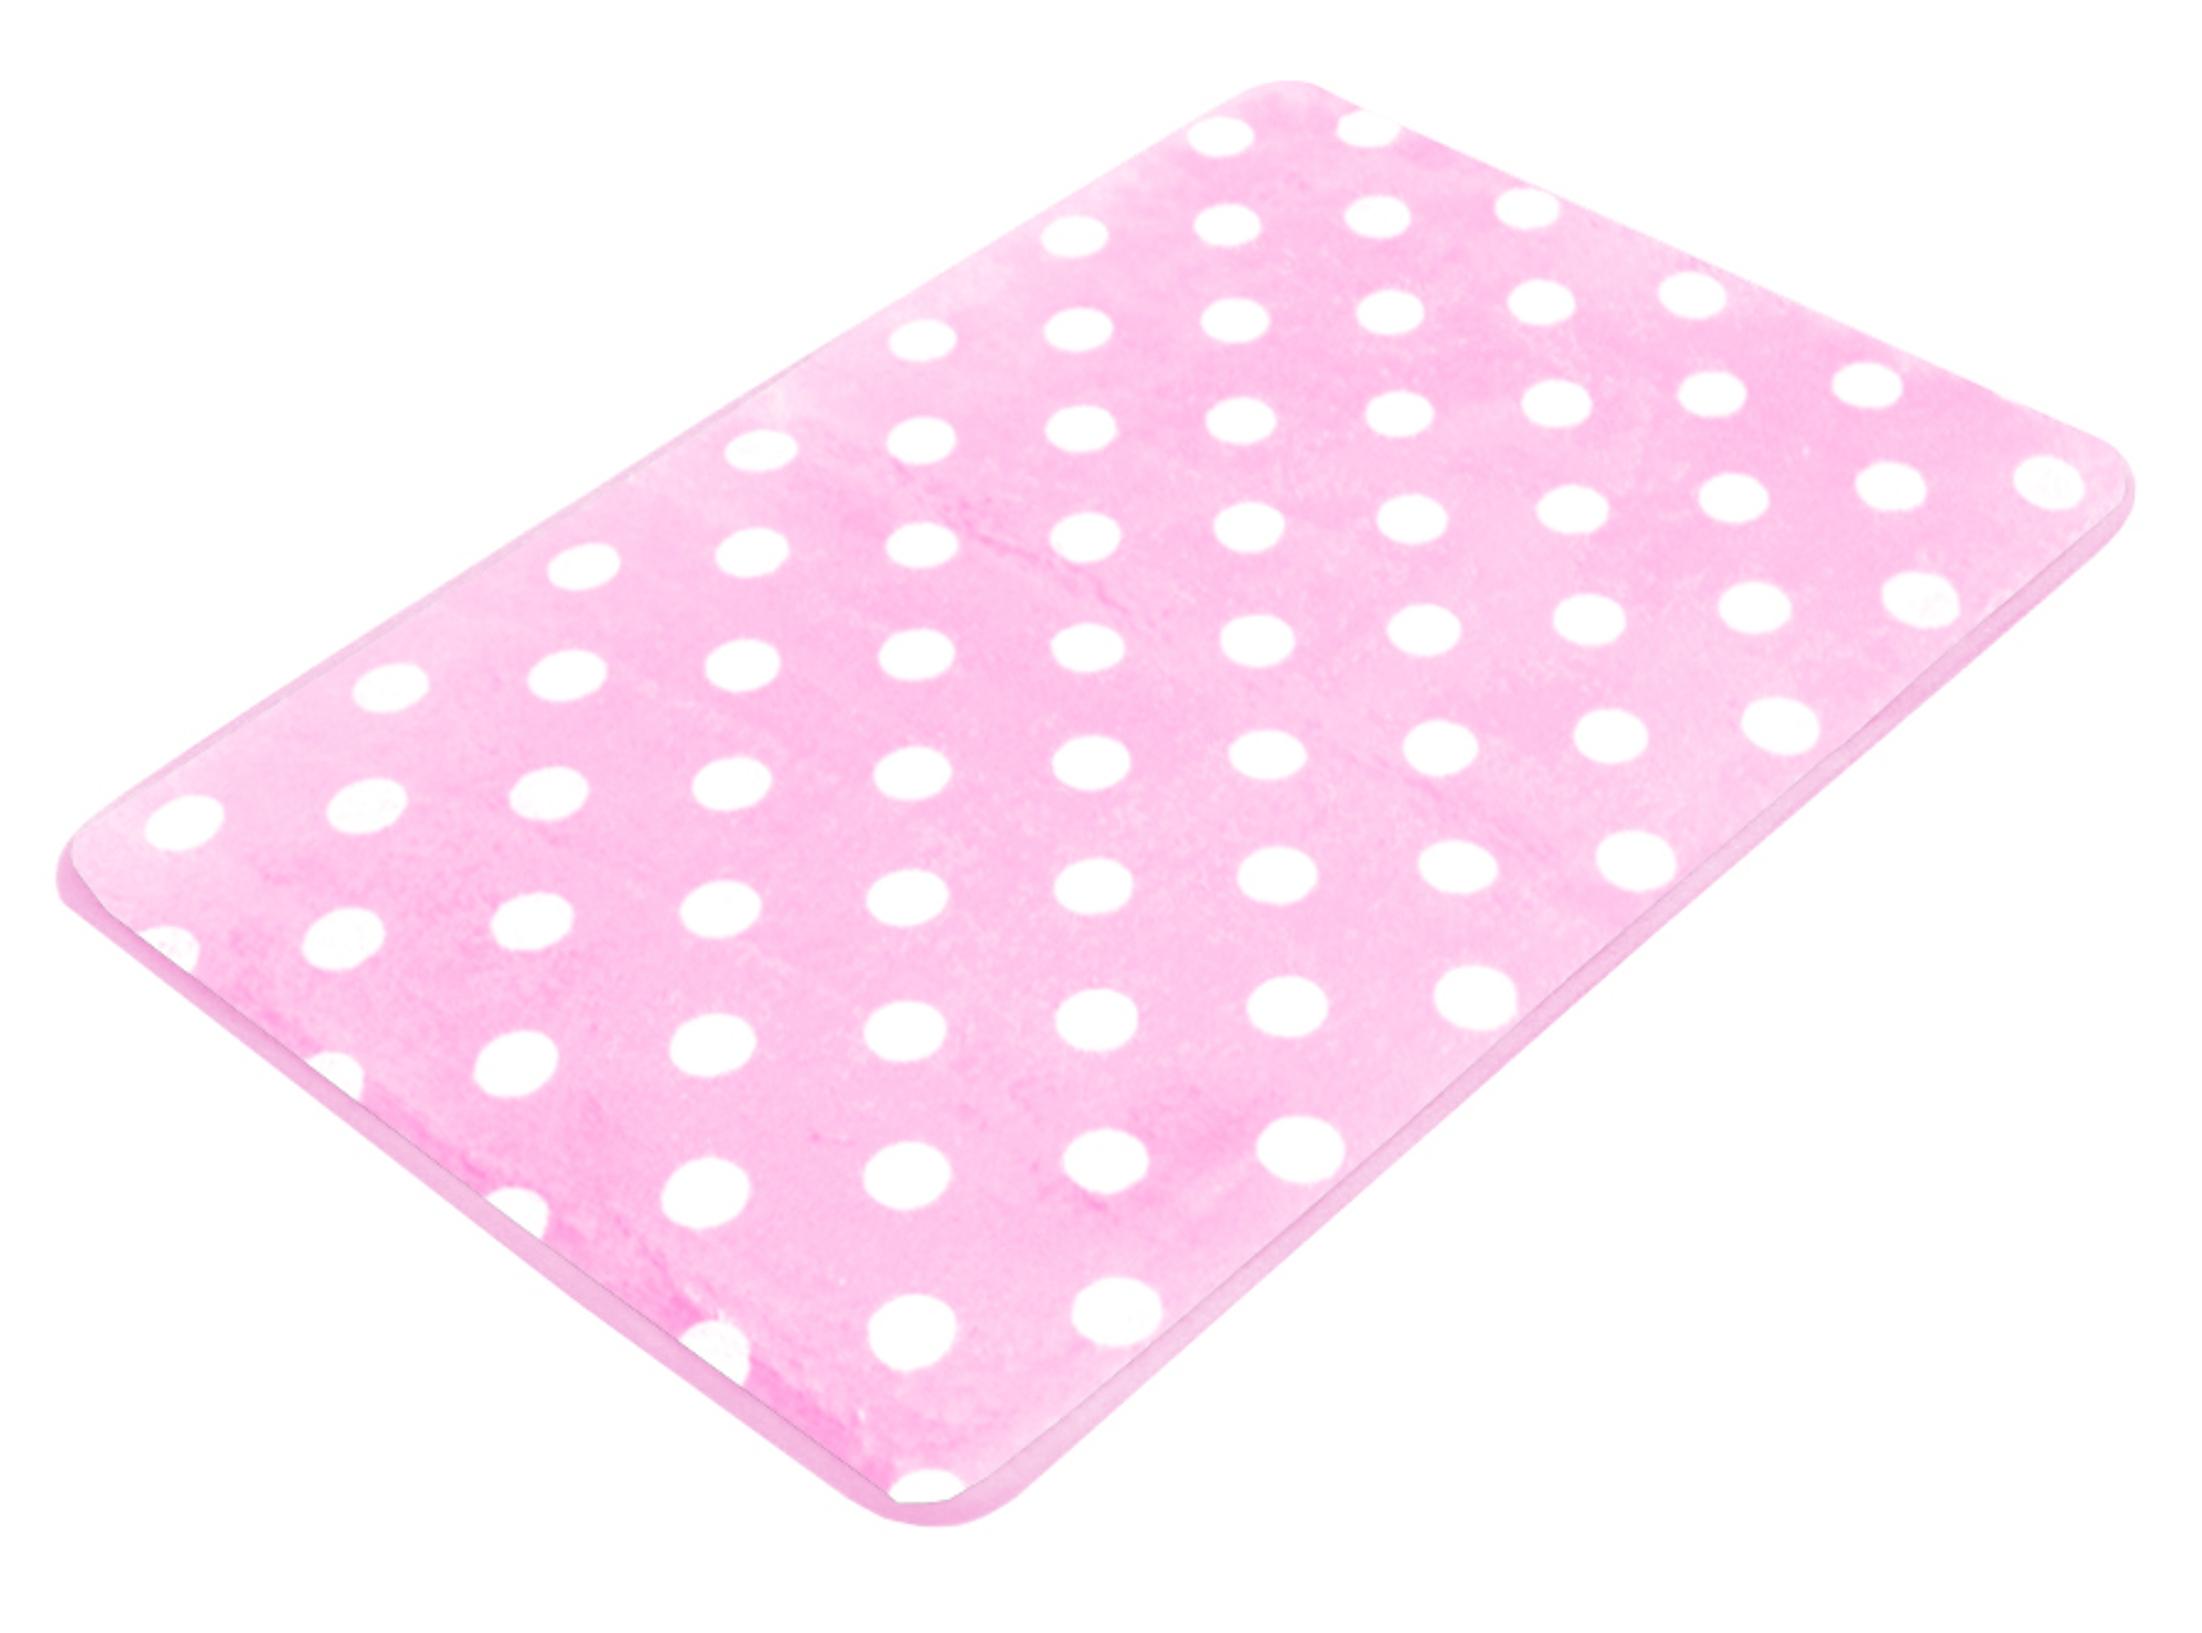 24 Original Pink Bath Rugs